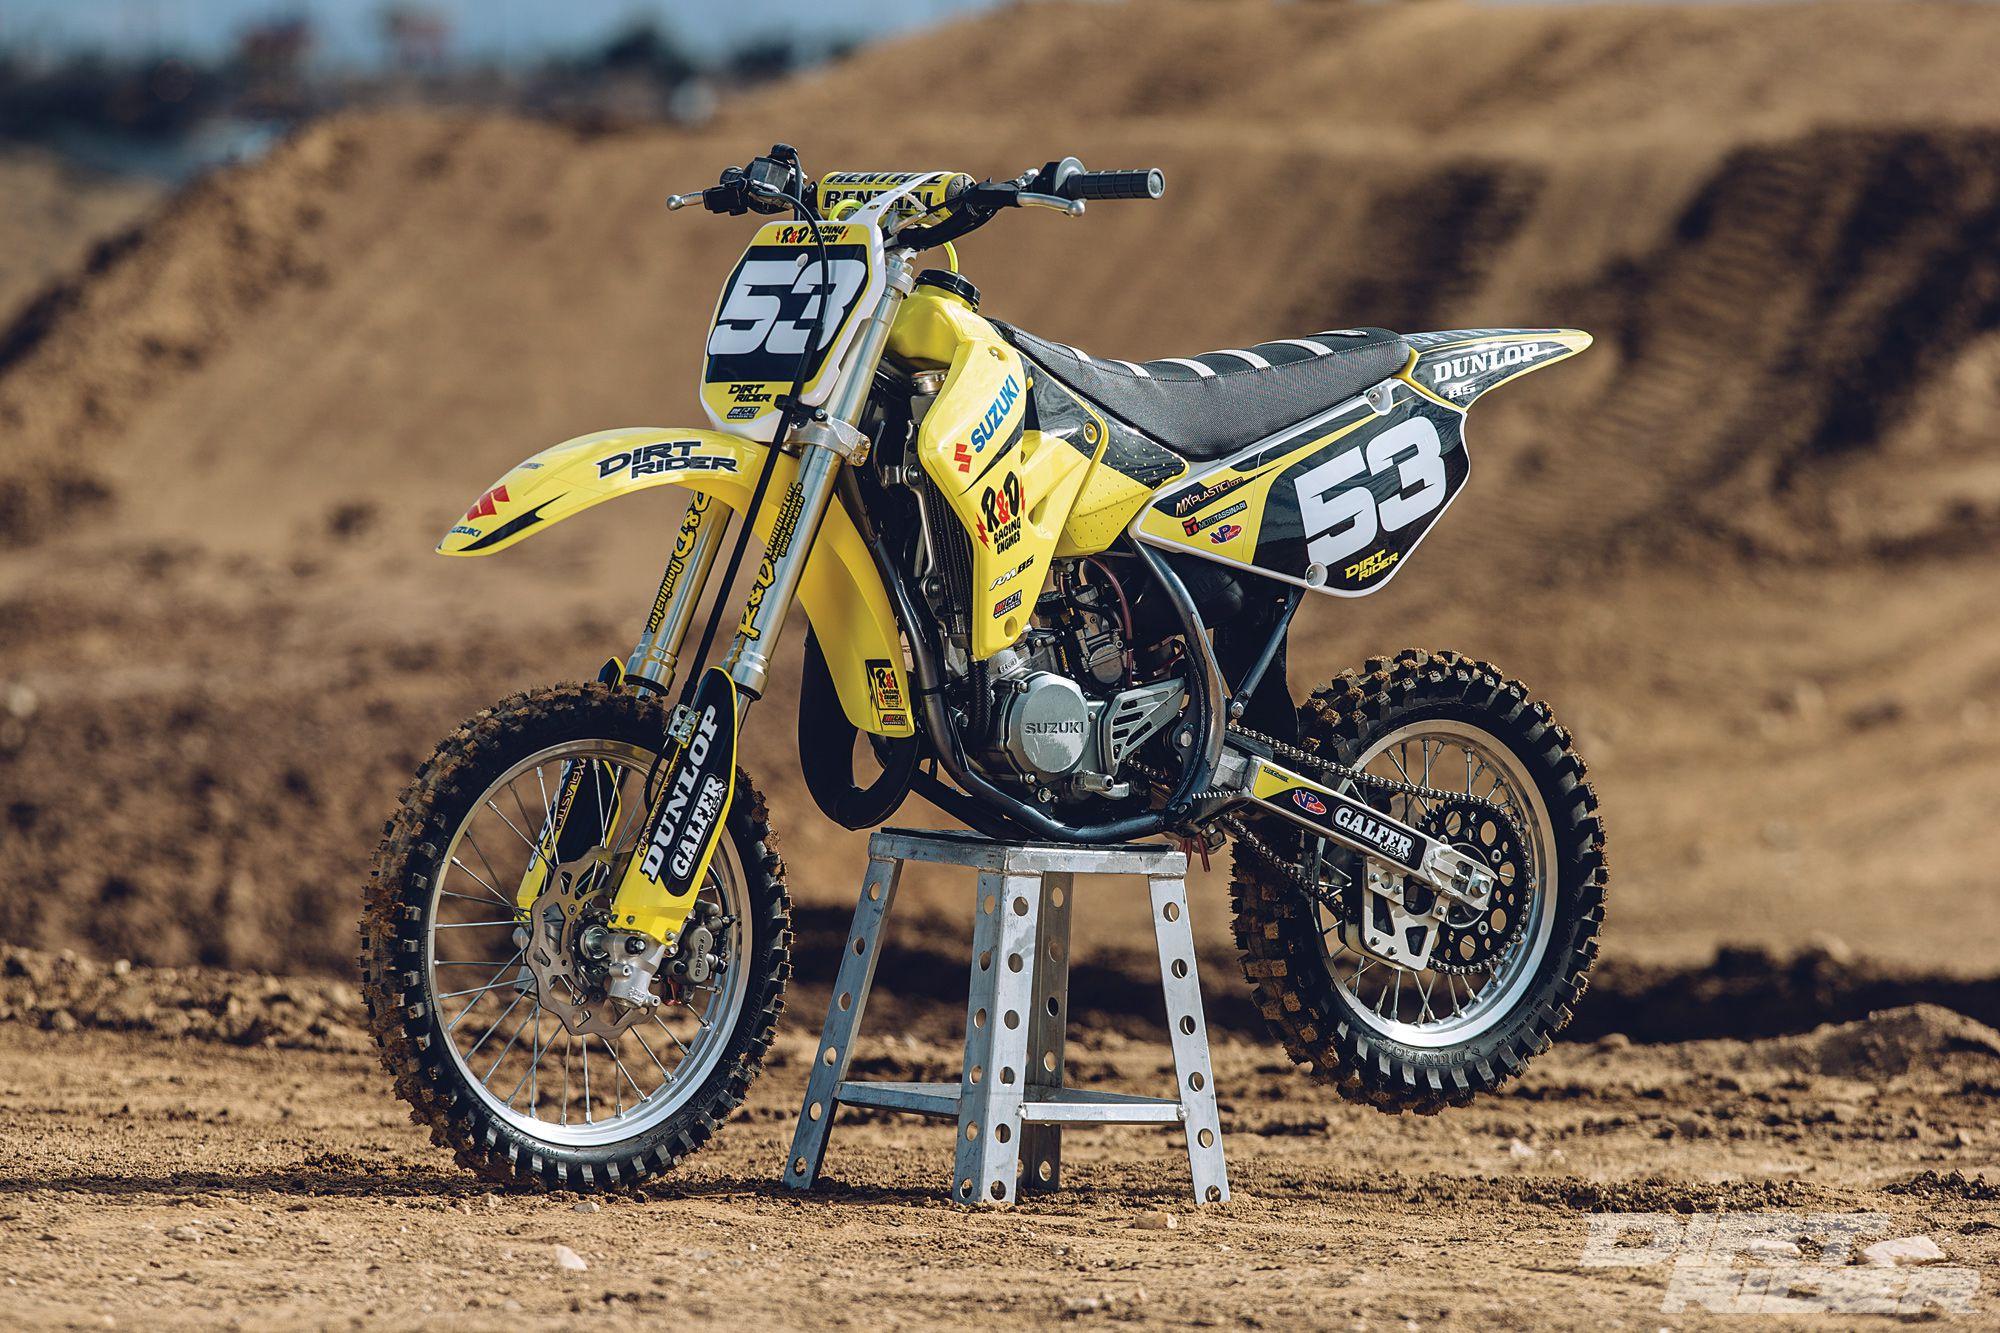 2016 Suzuki RM85 Factory R&D Project Bike | Dirt Rider